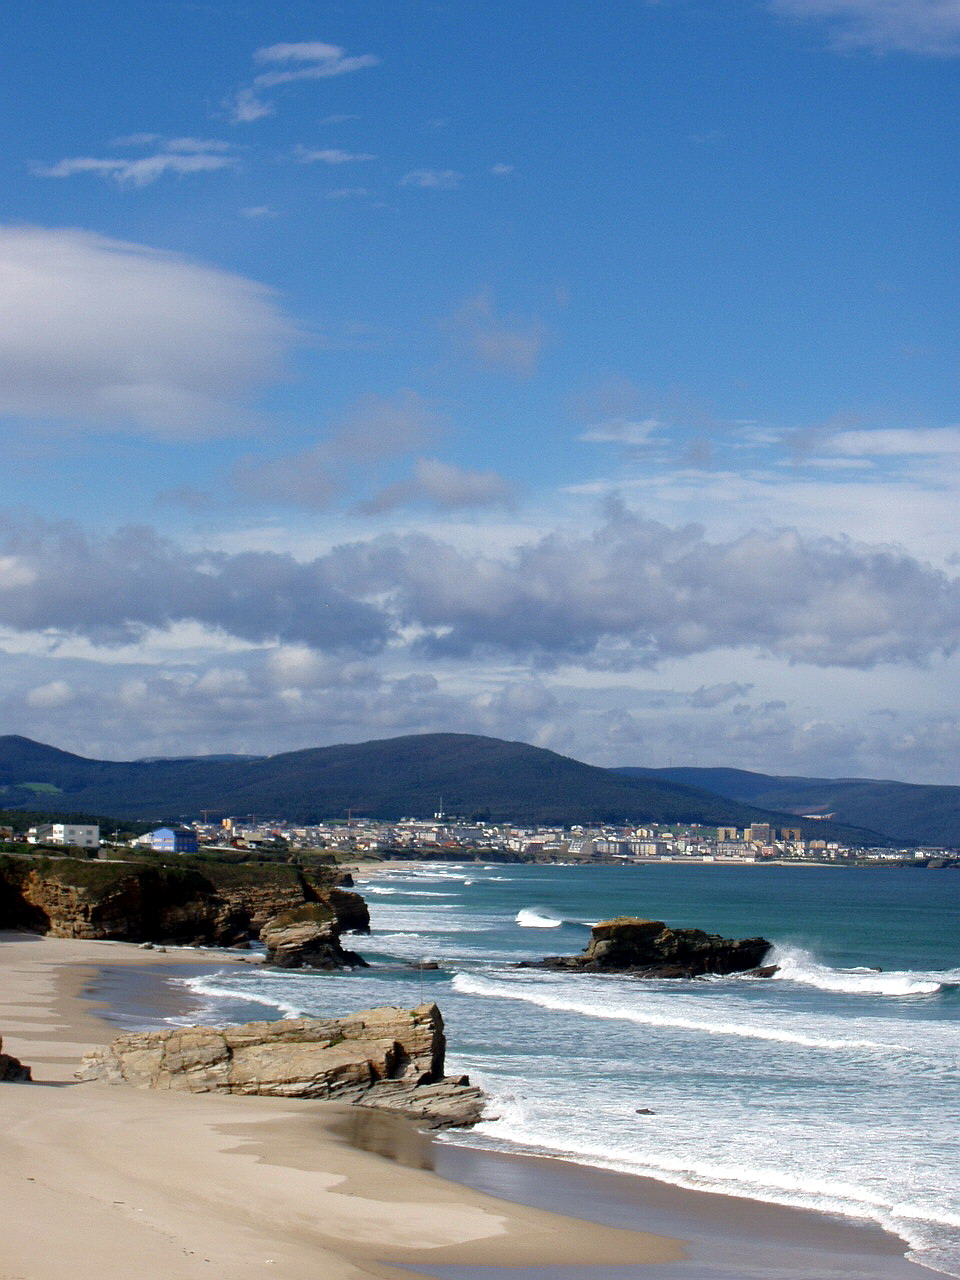 Foto playa San Pedro / Valea / Coto. Playa de San Bartolo, San Cosme de Barreiros, Lugo, España